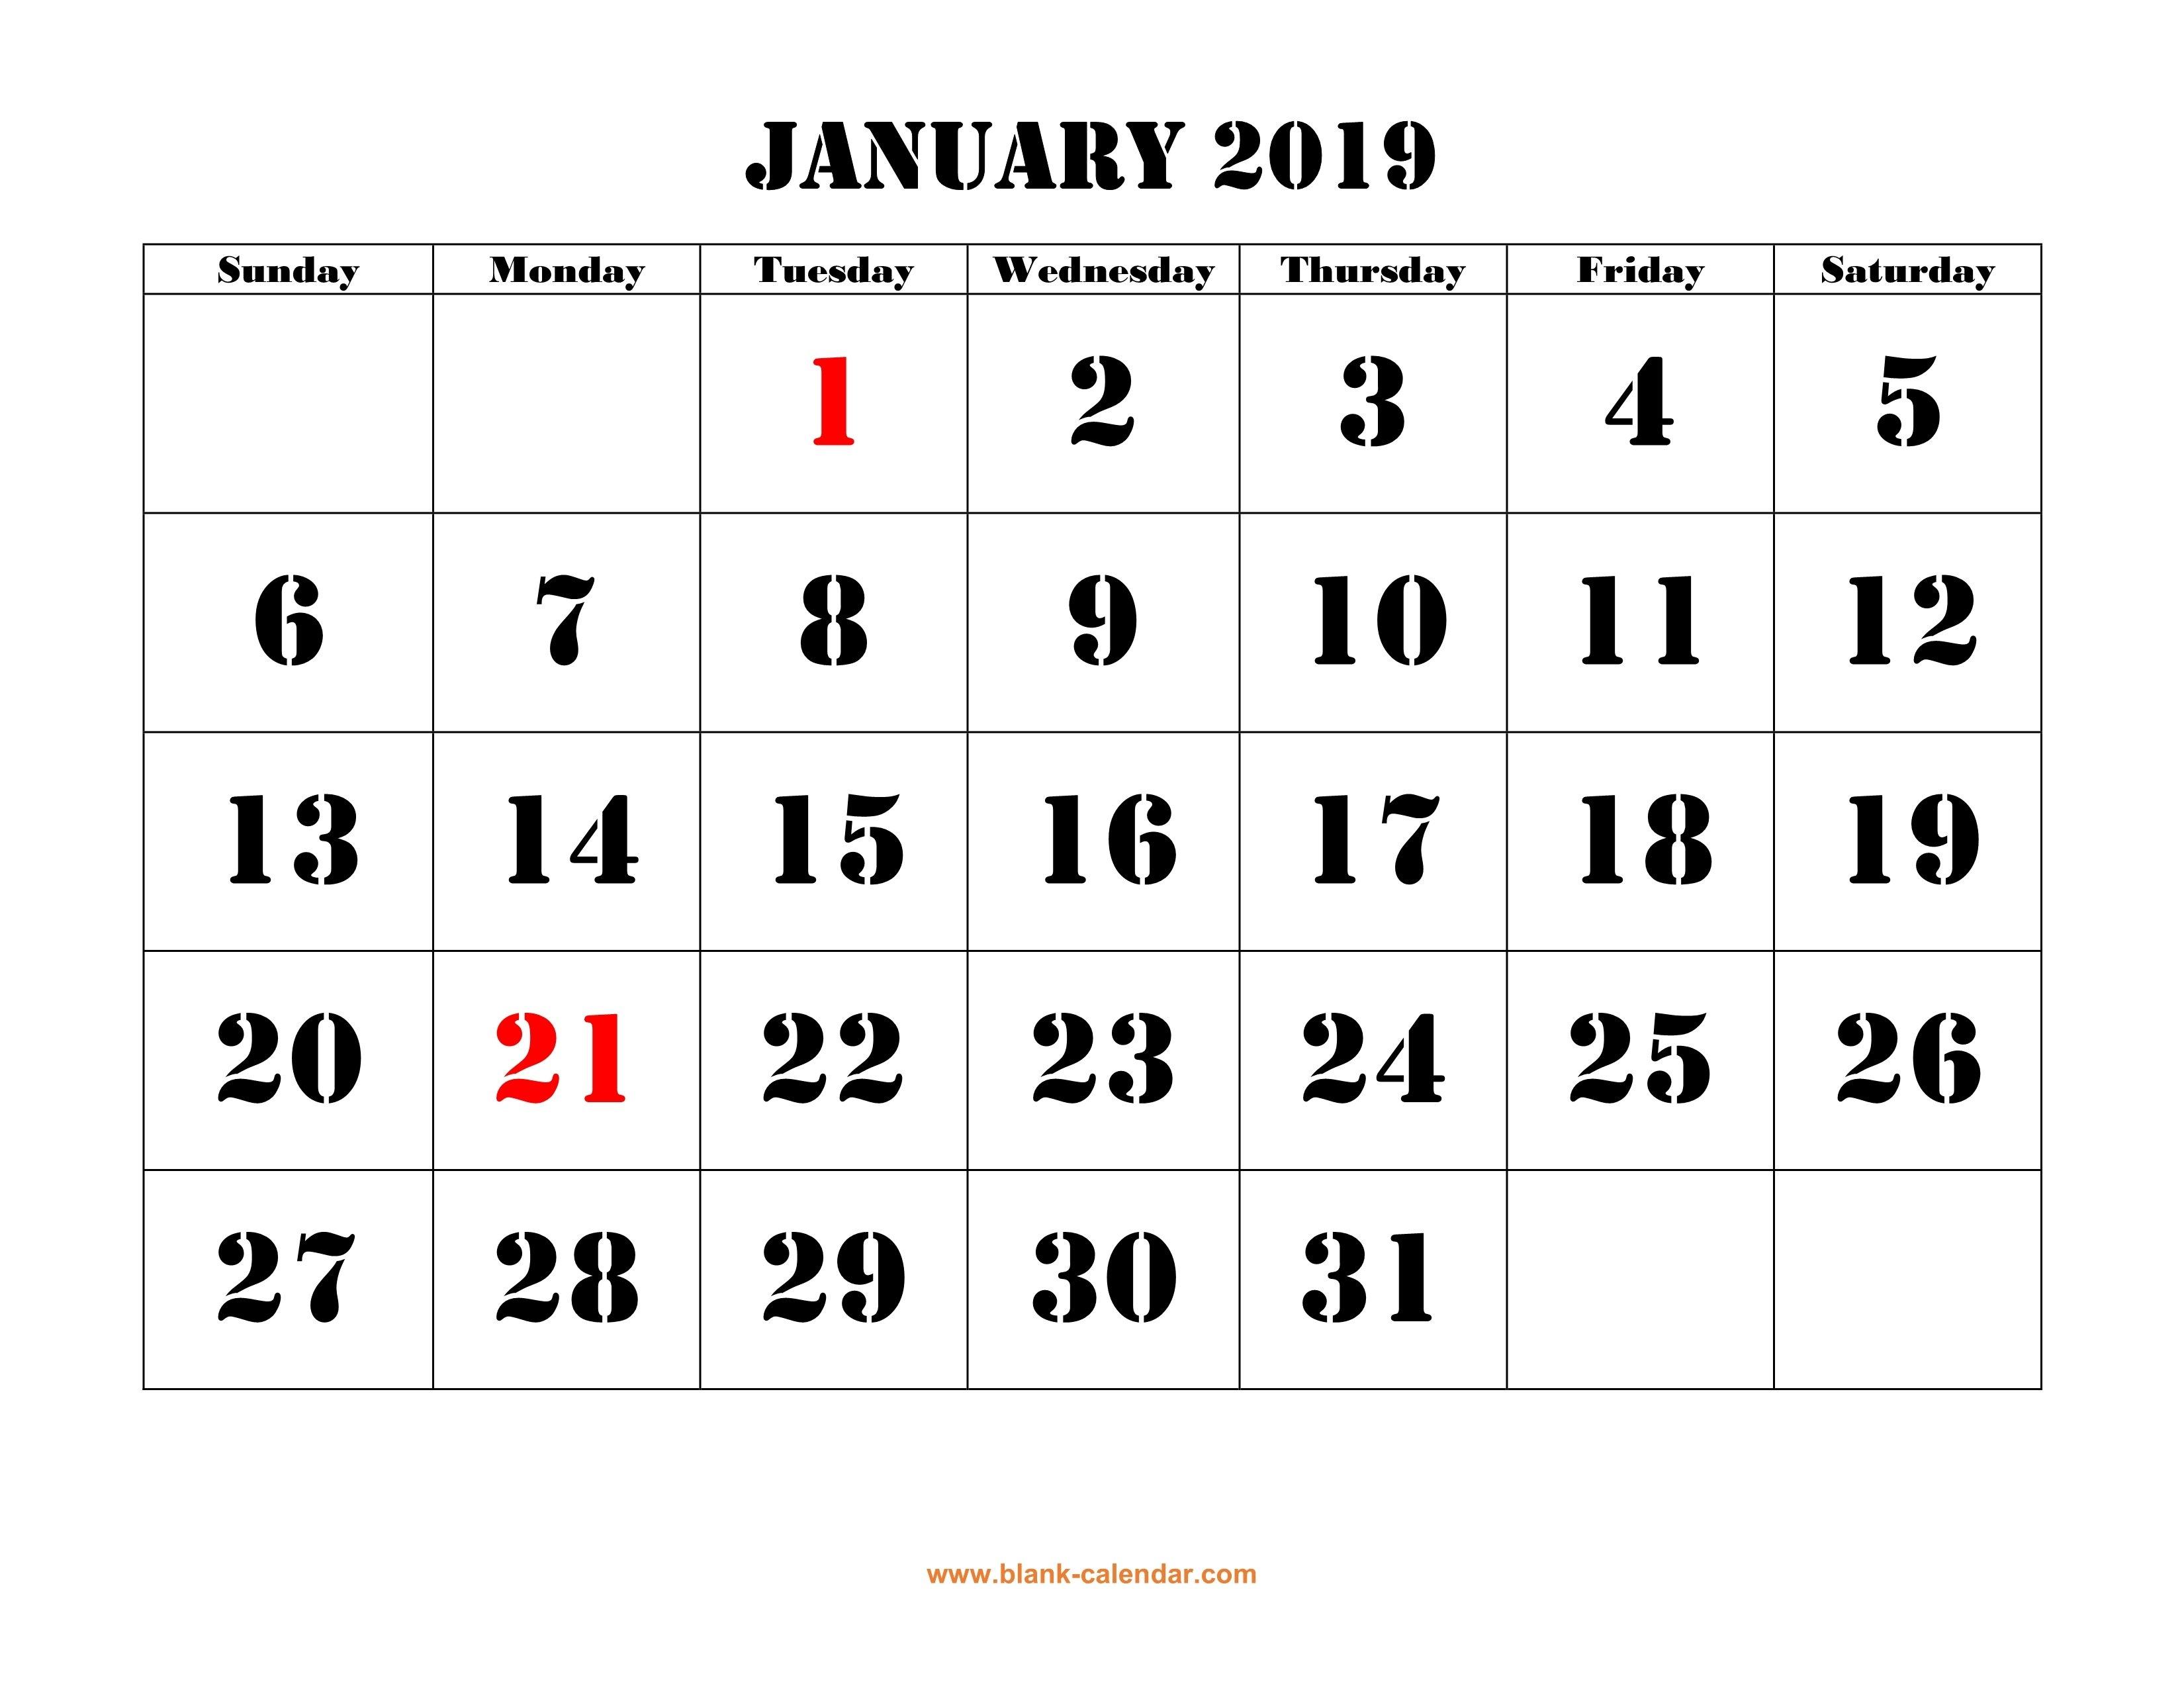 Free Download Printable January 2019 Calendar, Large Font Design Calendar 2019 January With Holidays